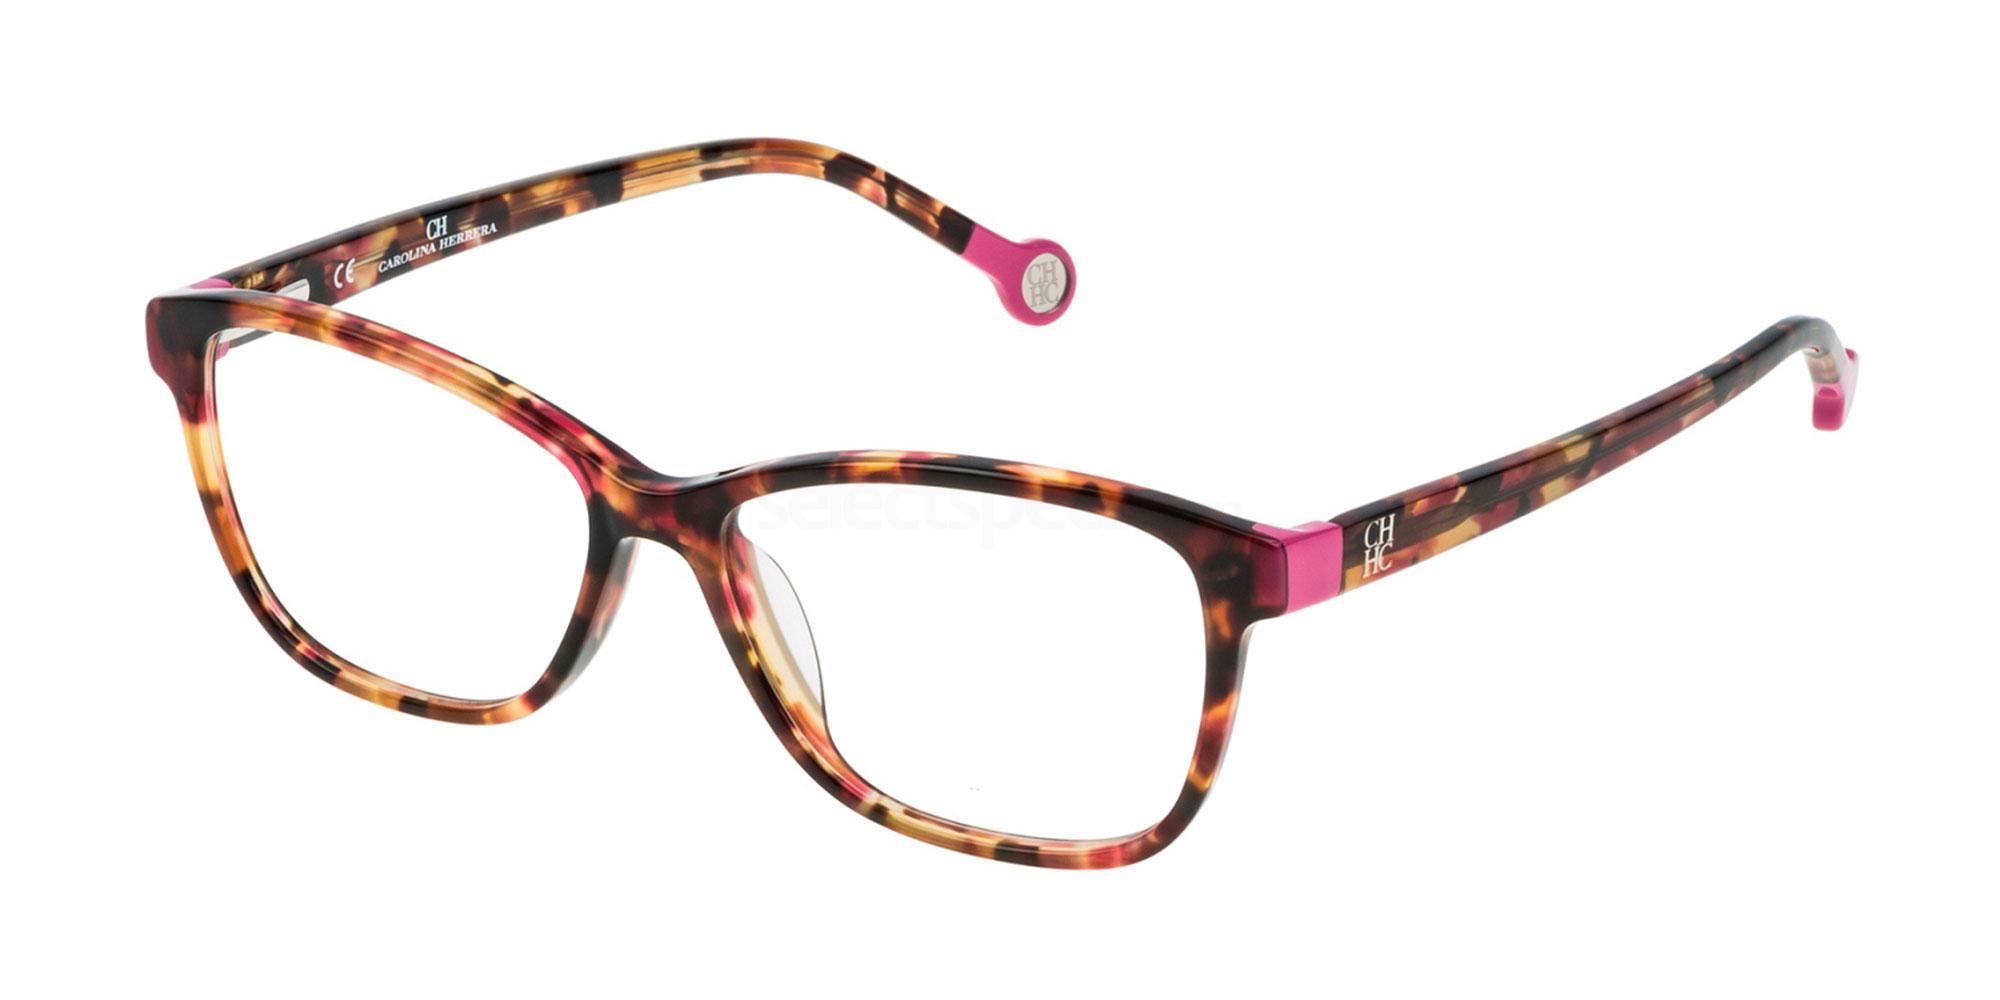 01GQ VHE679 Glasses, CH Carolina Herrera